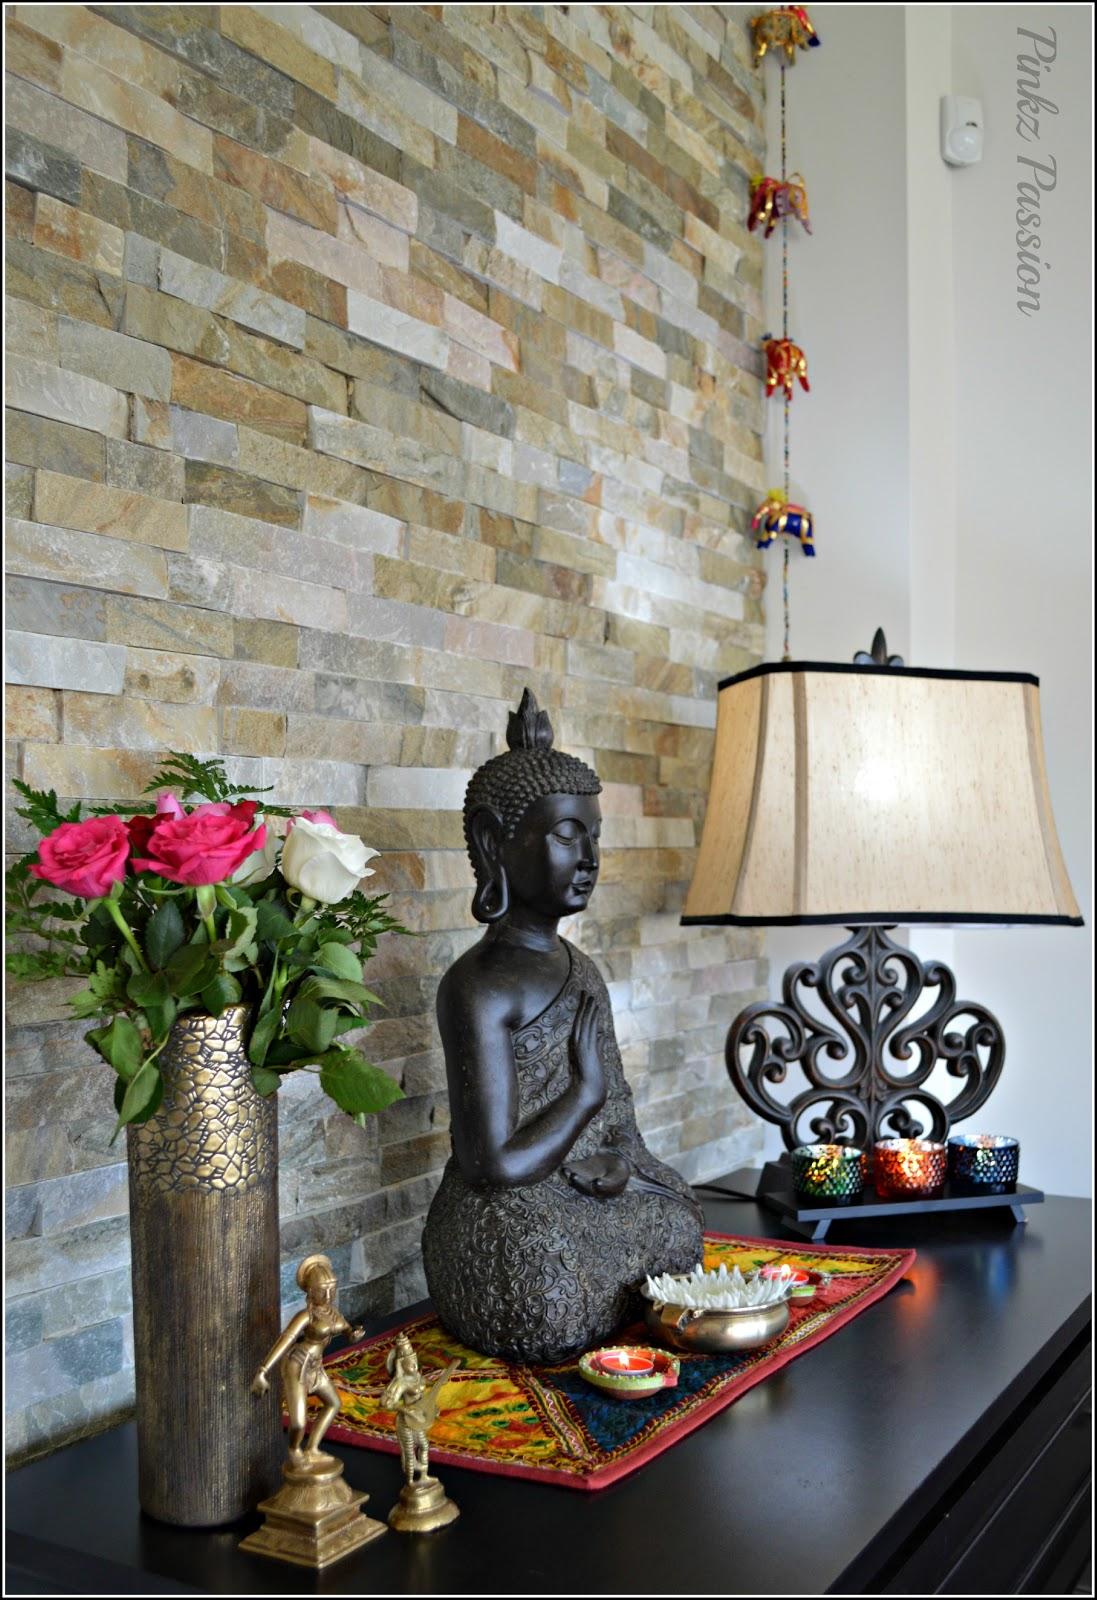 pinkz passion diwali inspiration 2 home tour. Black Bedroom Furniture Sets. Home Design Ideas